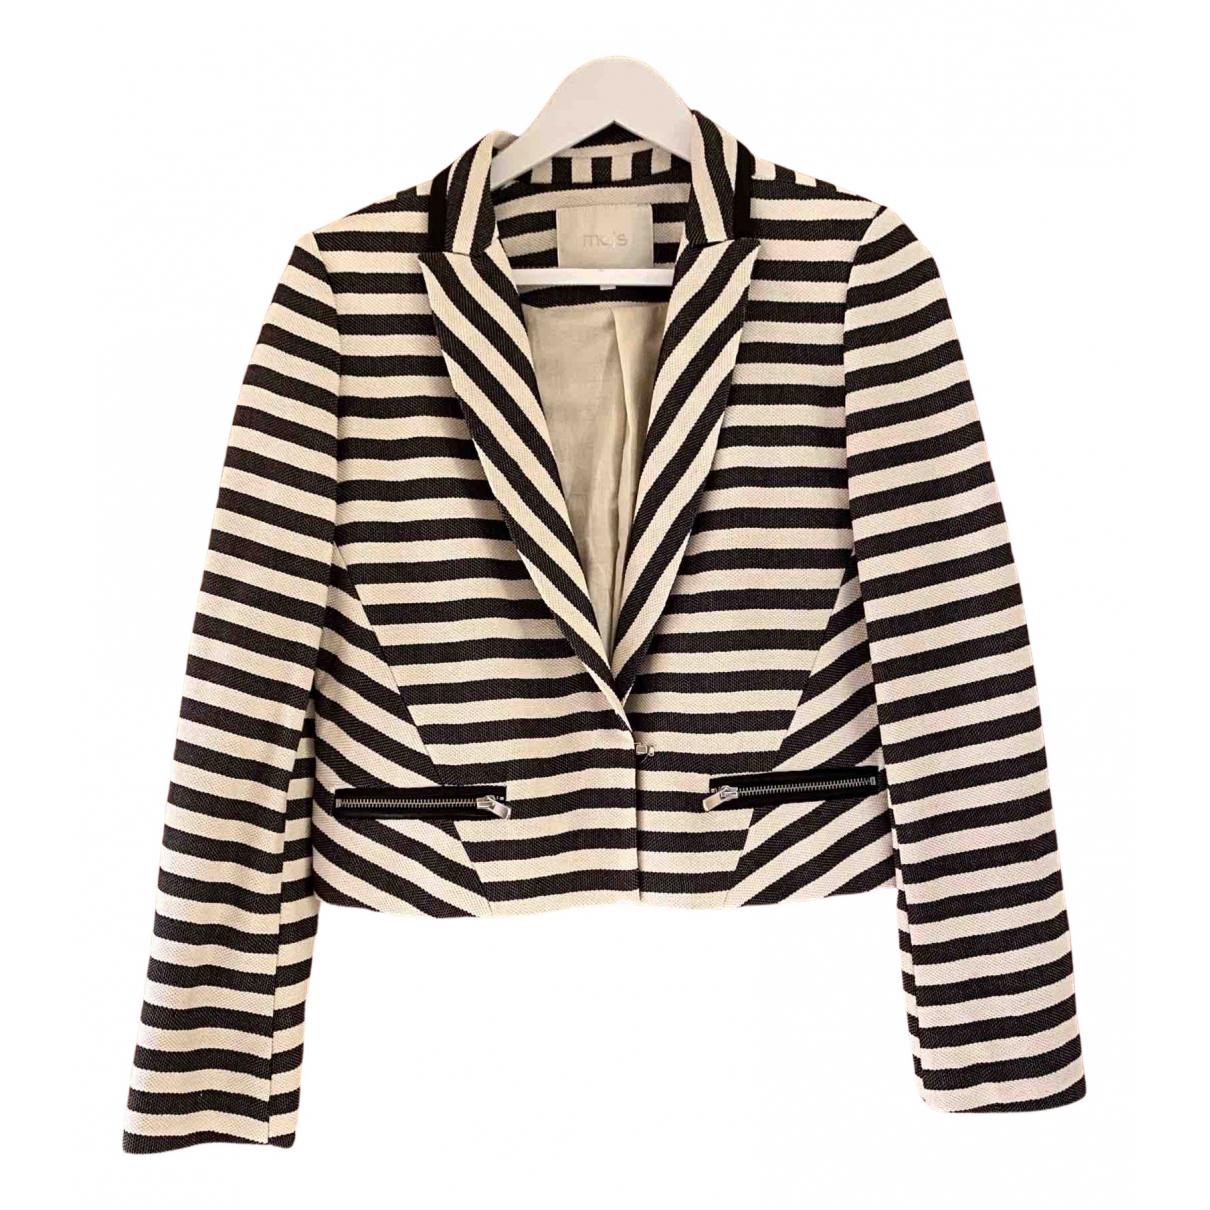 Maje N Multicolour Cotton jacket for Women 36 FR